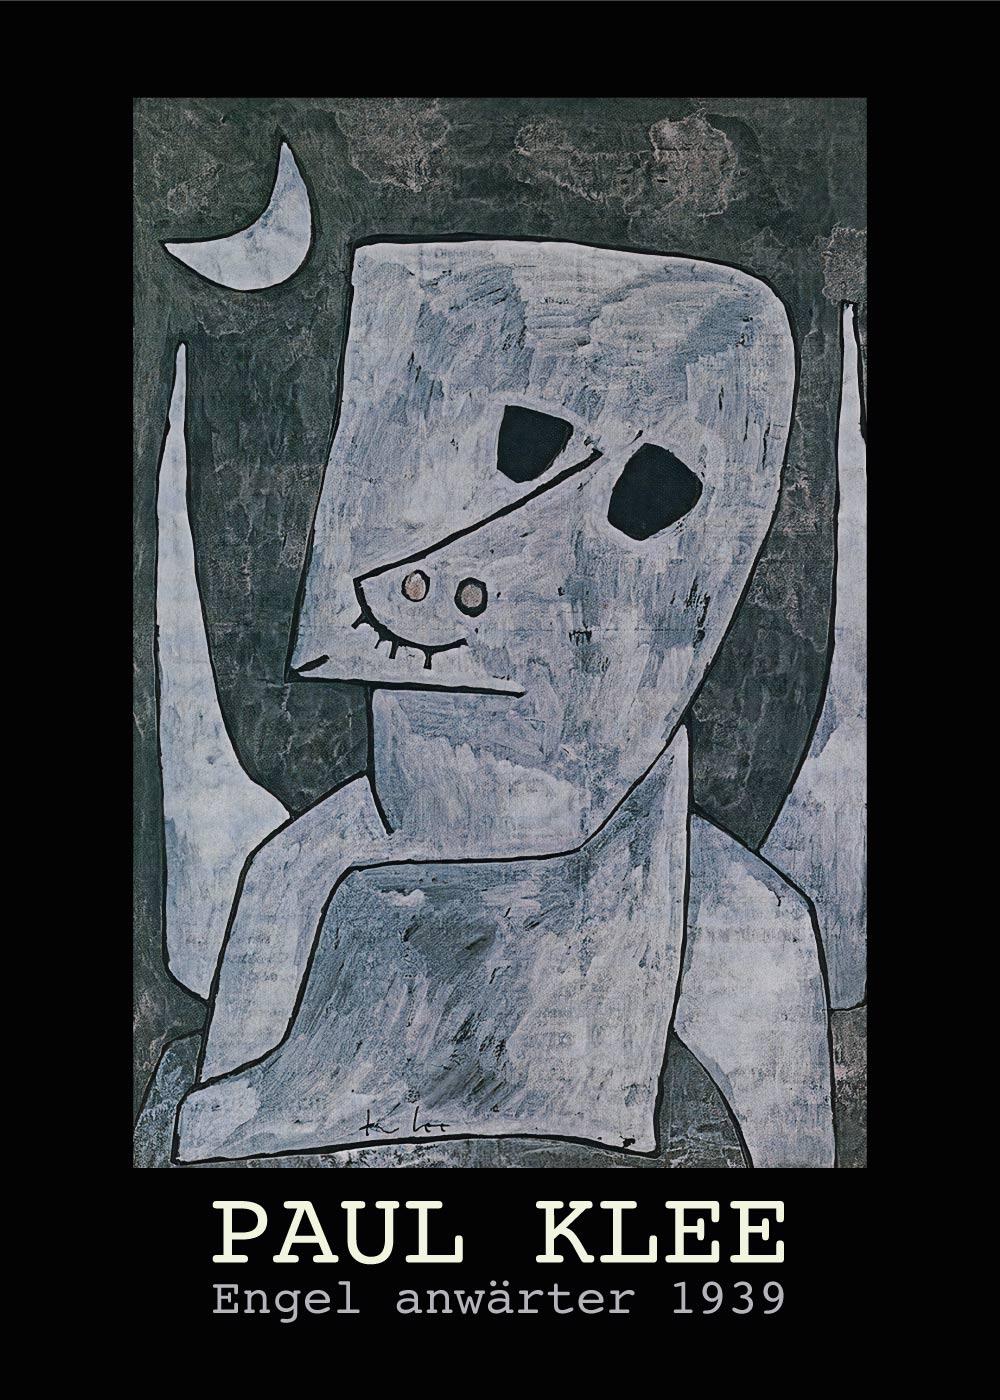 Engel anwärter - Paul Klee Kunstplakat